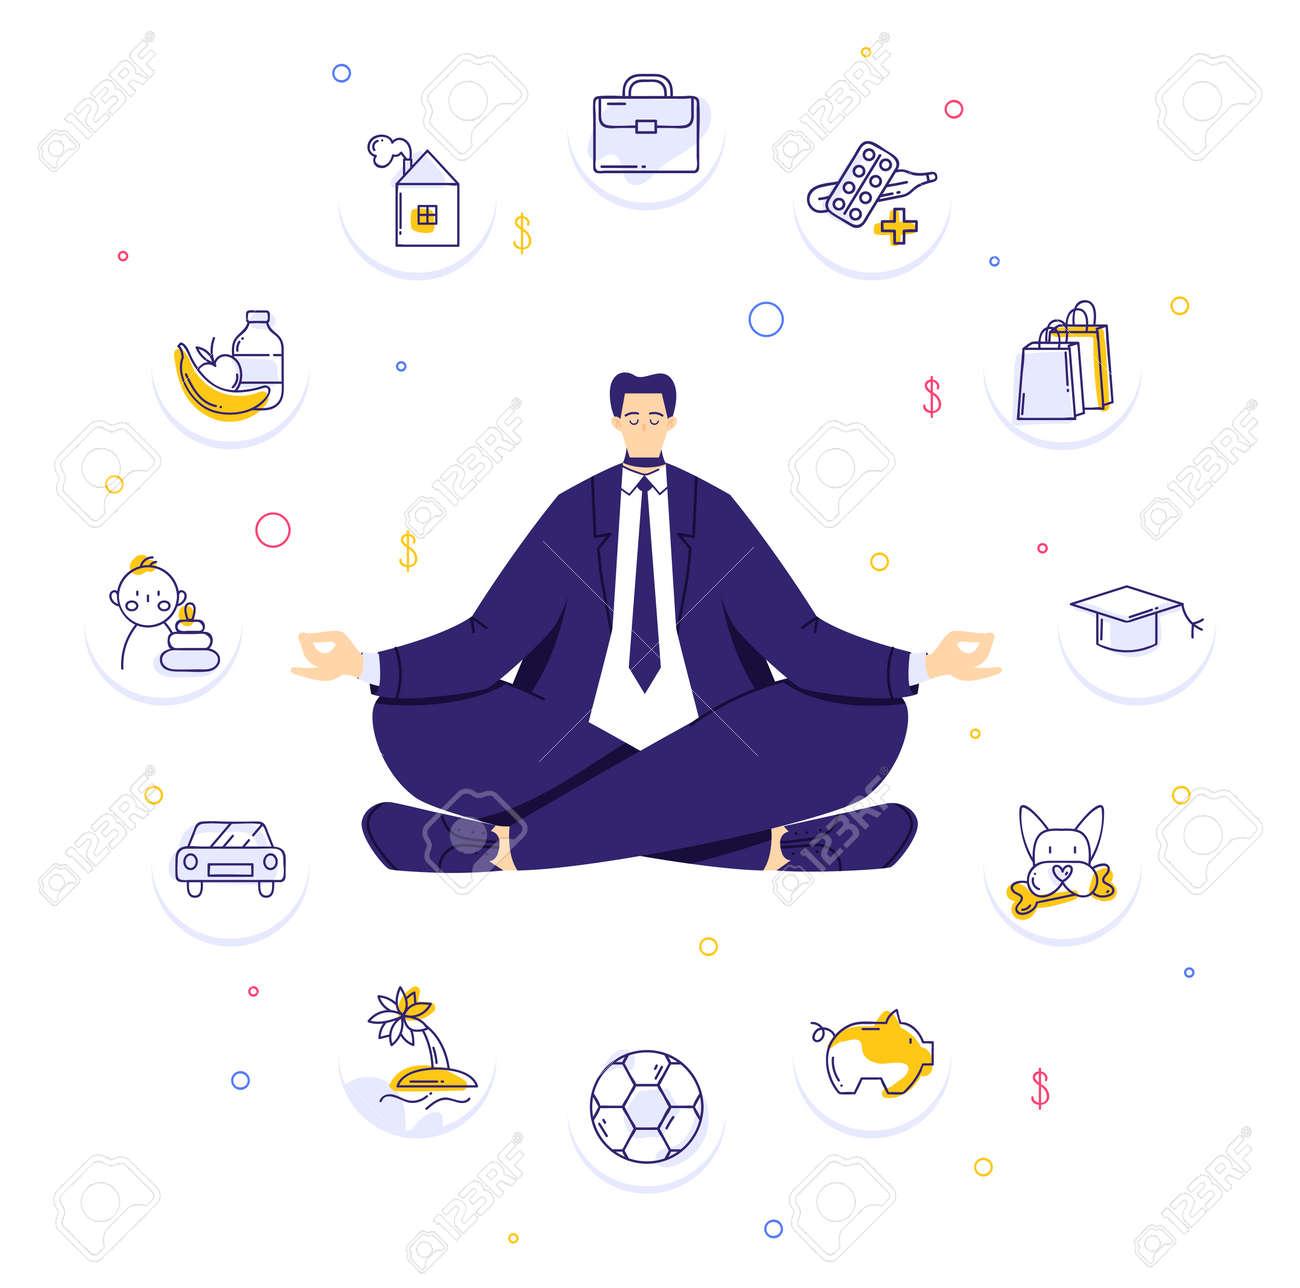 Man sitting in yoga lotus pose and meditating. Human needs icons. Life balance concept - 170358967